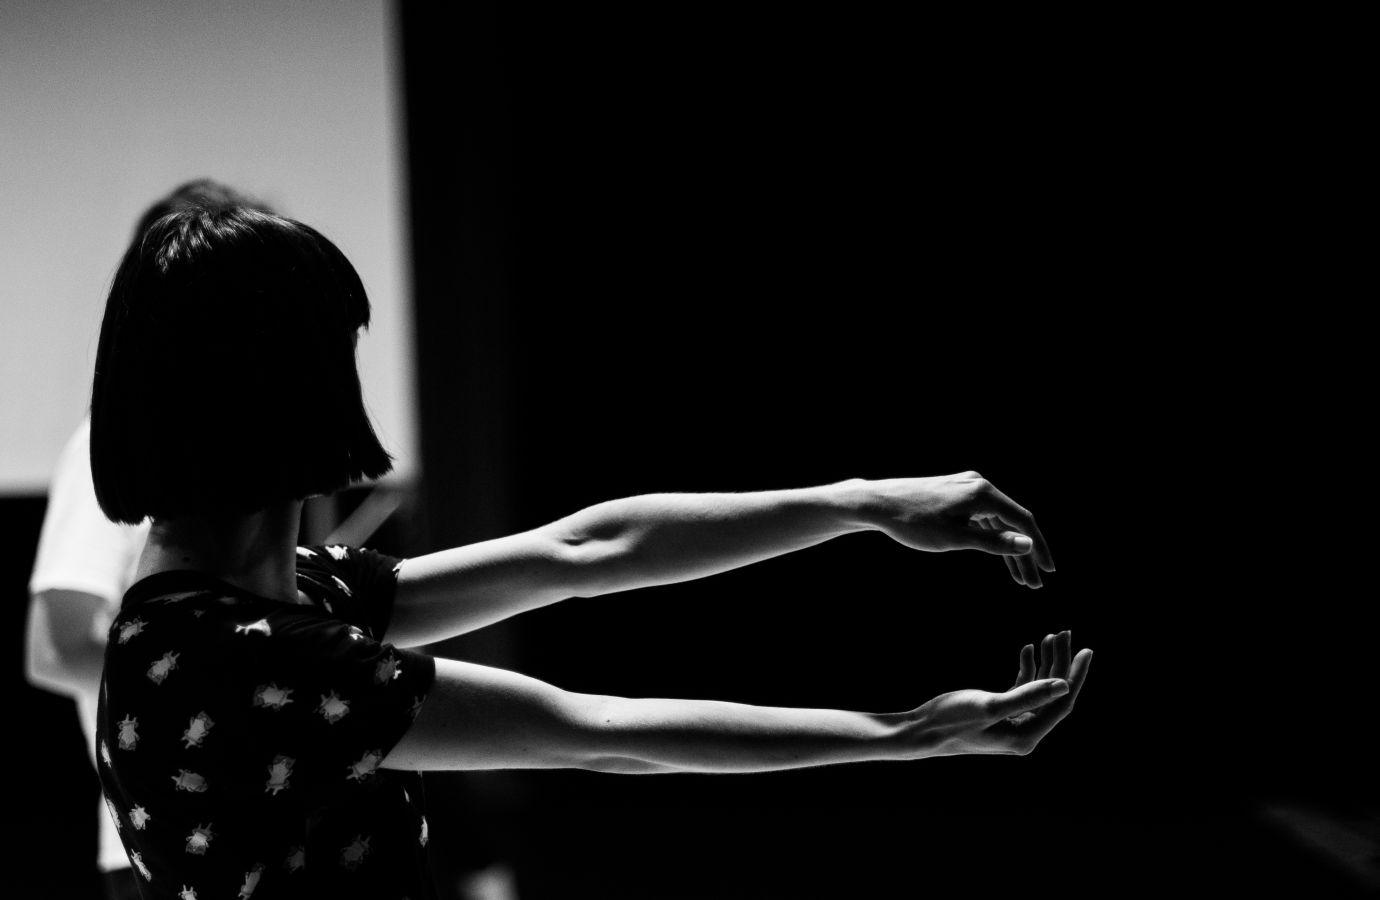 © Ioana Iordache